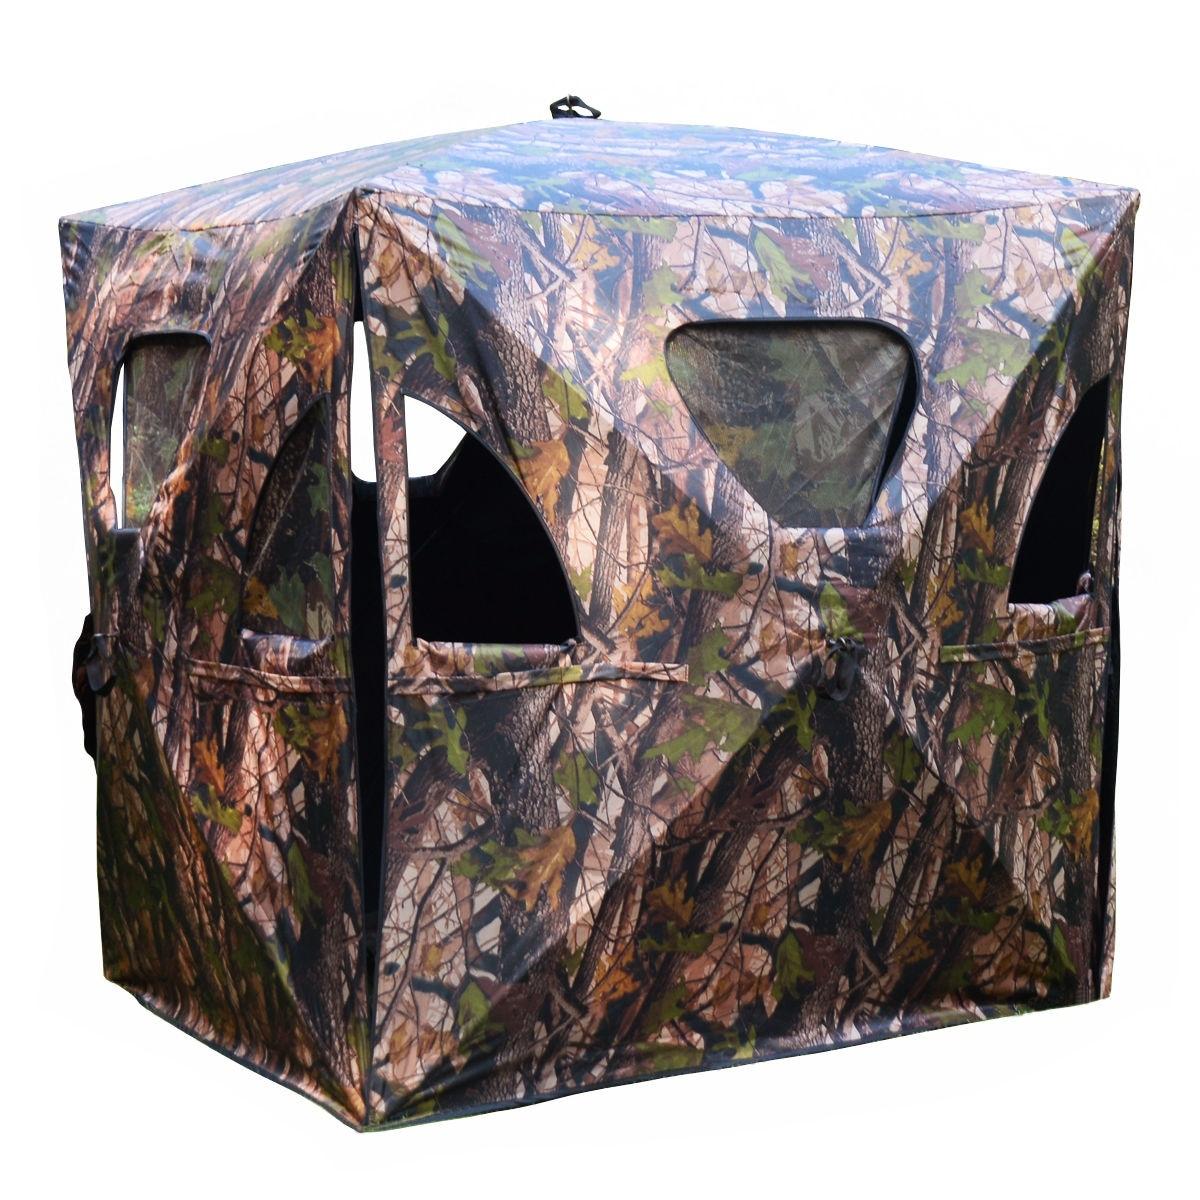 Ground Hunting Blind Portable Pop up Camo Hunter Mesh thumbnail